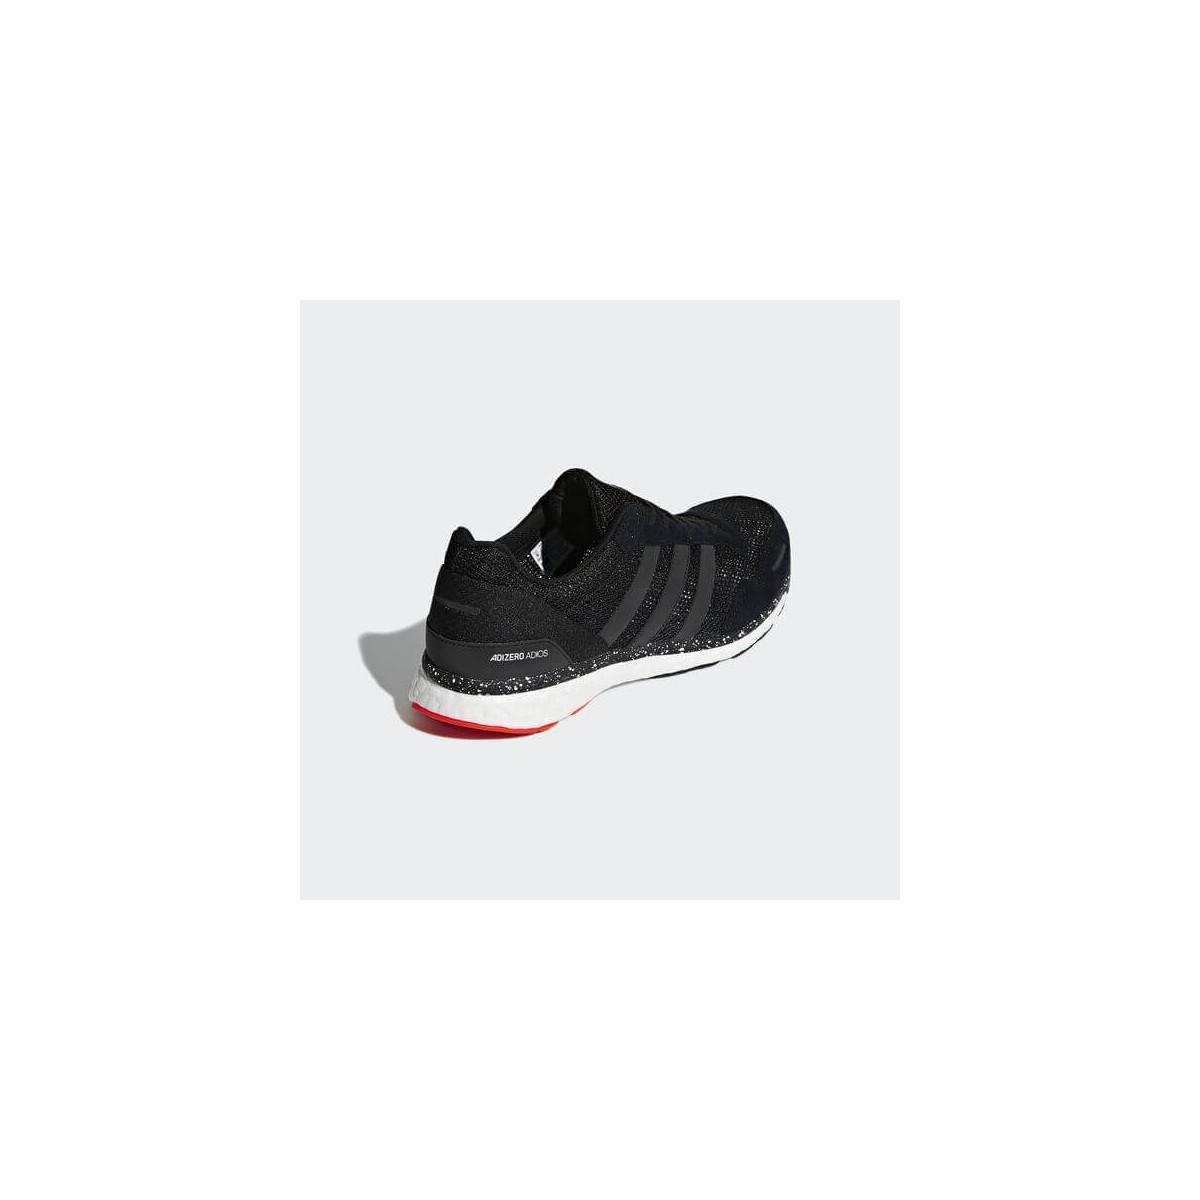 reputable site c477c 520a0 Zapatillas Adidas Adizero Adios 3 Negro OI18